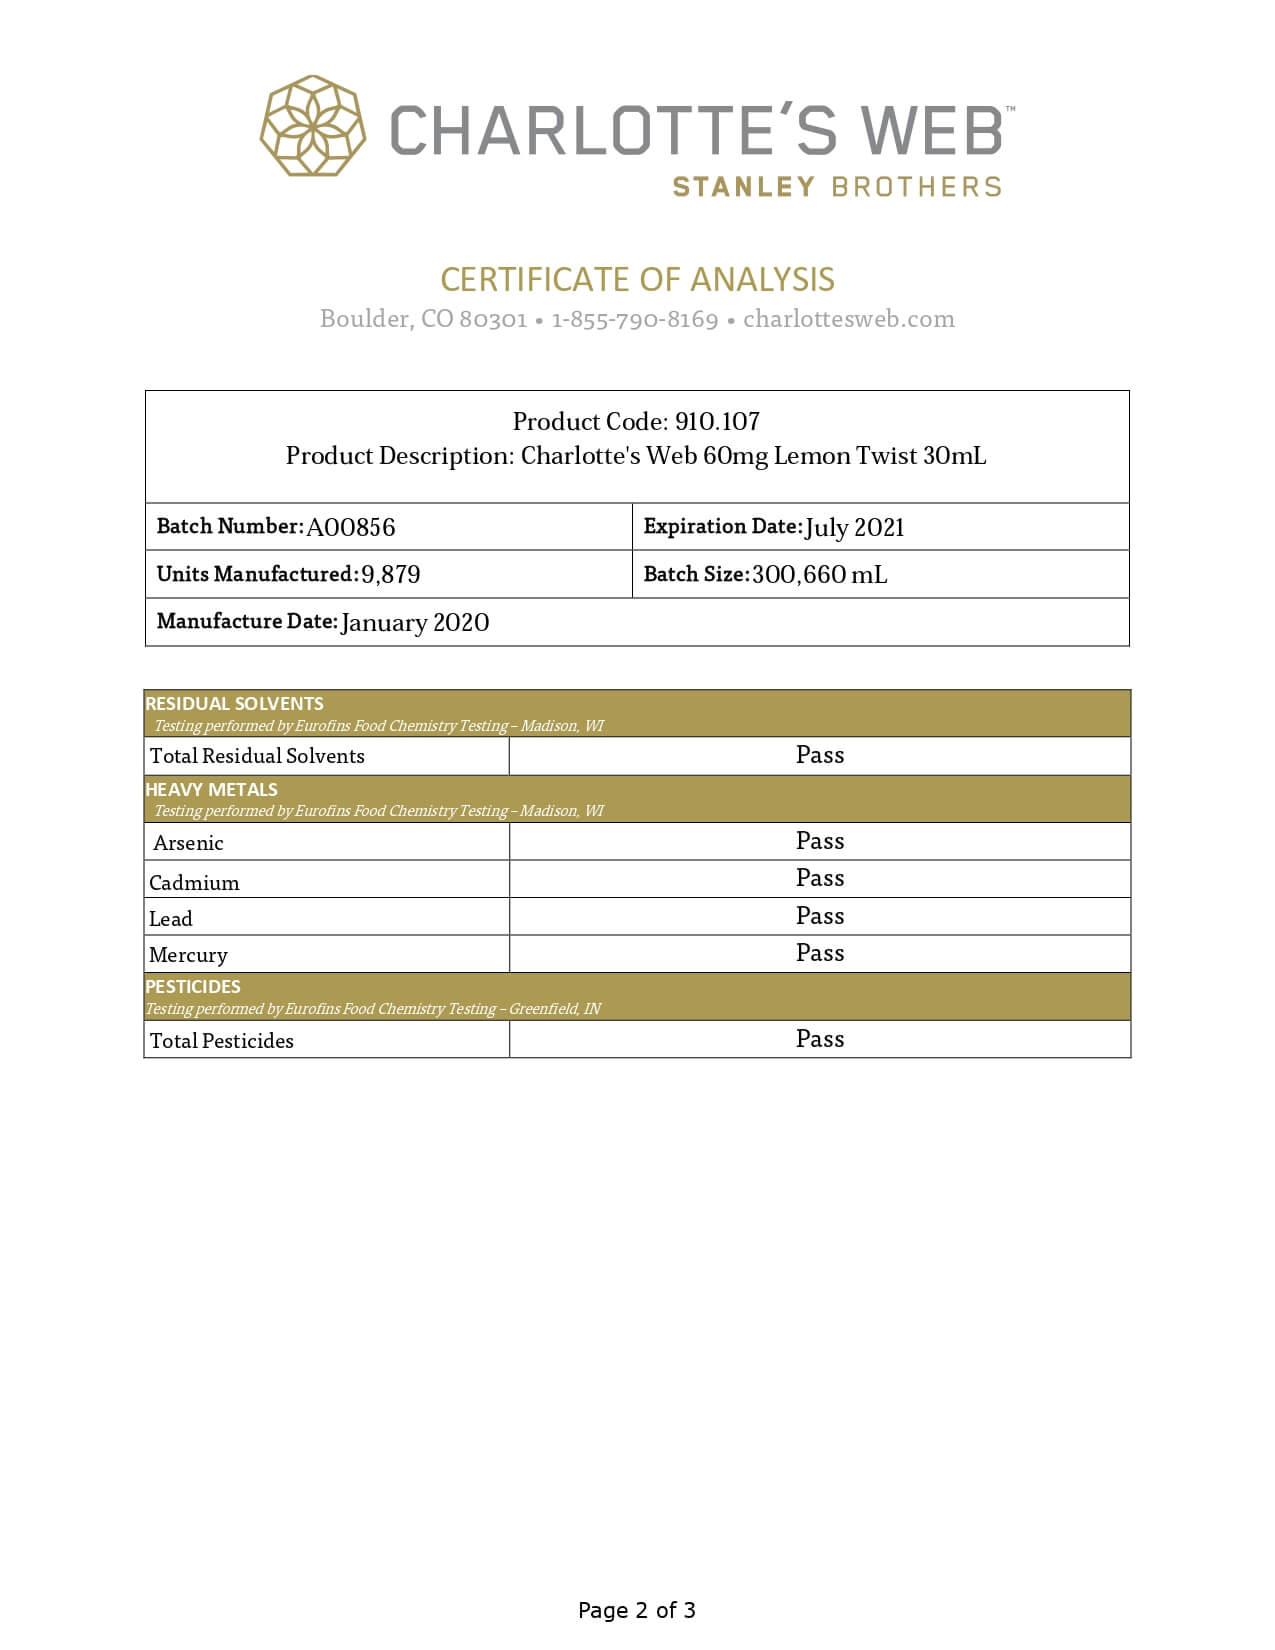 Charlottes Web CBD Tincture Full Spectrum Lemon Twist 60mg 1ml Lab Report